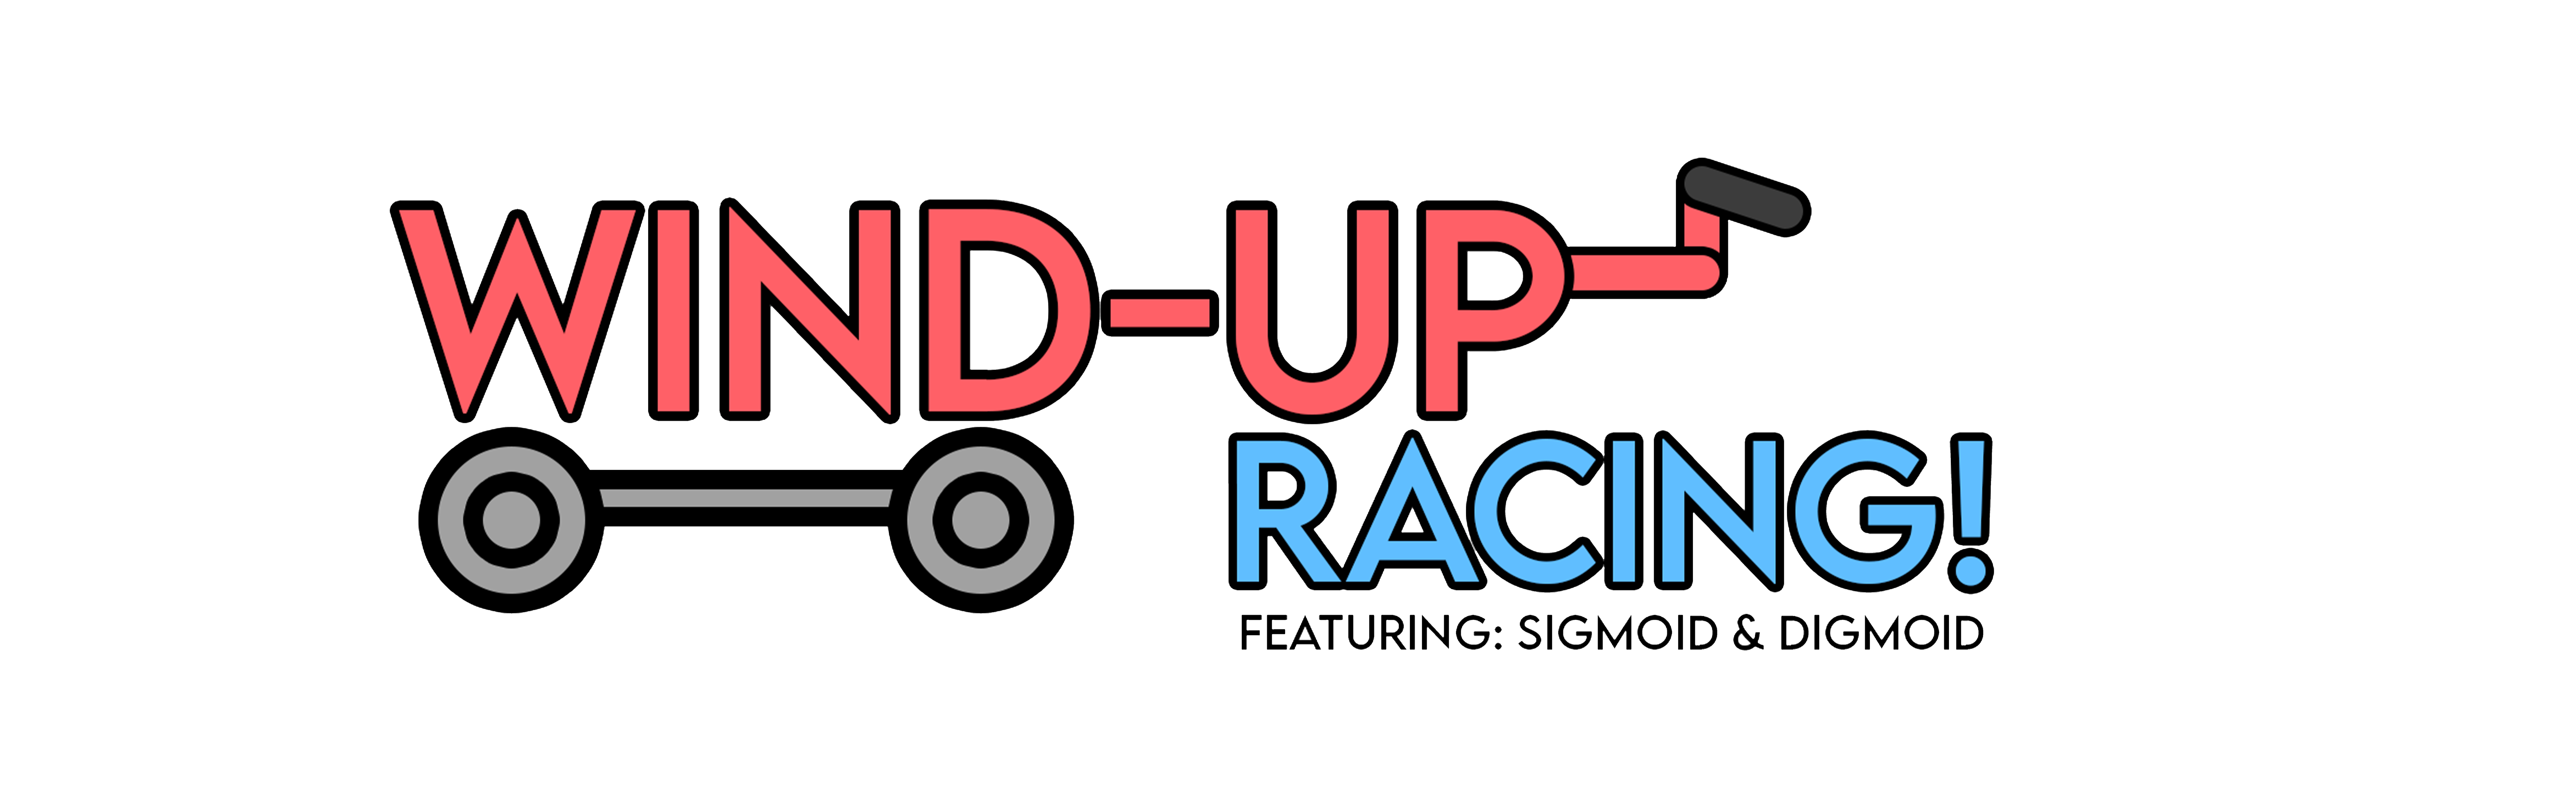 Wind-Up Racing!